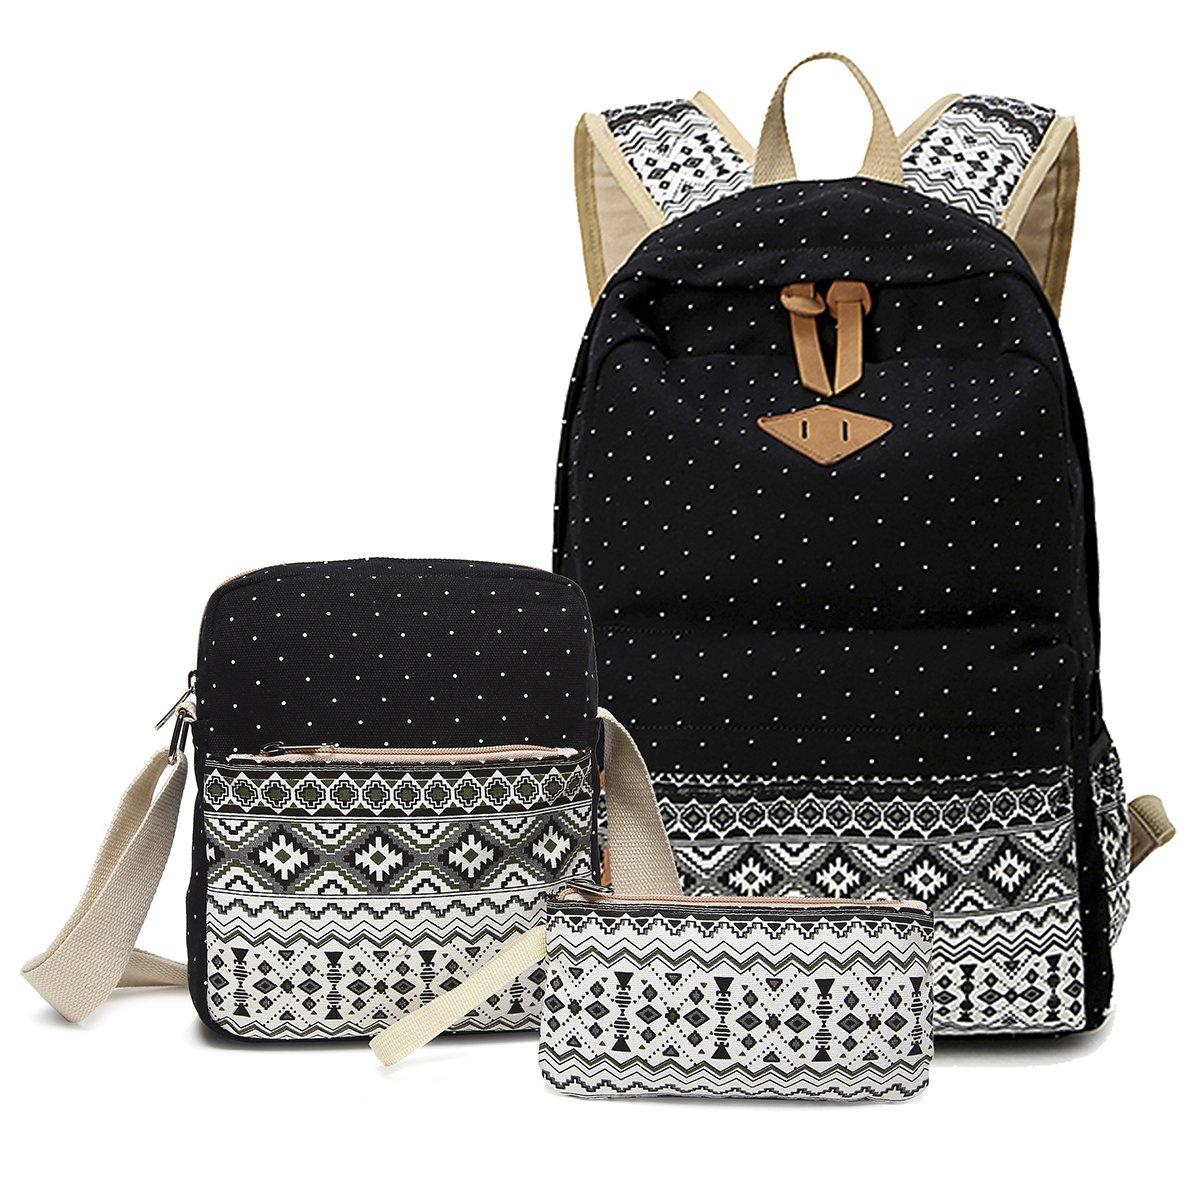 332c720e49 Abshoo Canvas Dot Backpack Cute Lightweight Teen Girls Backpacks School  Shoulder Bags (Black)